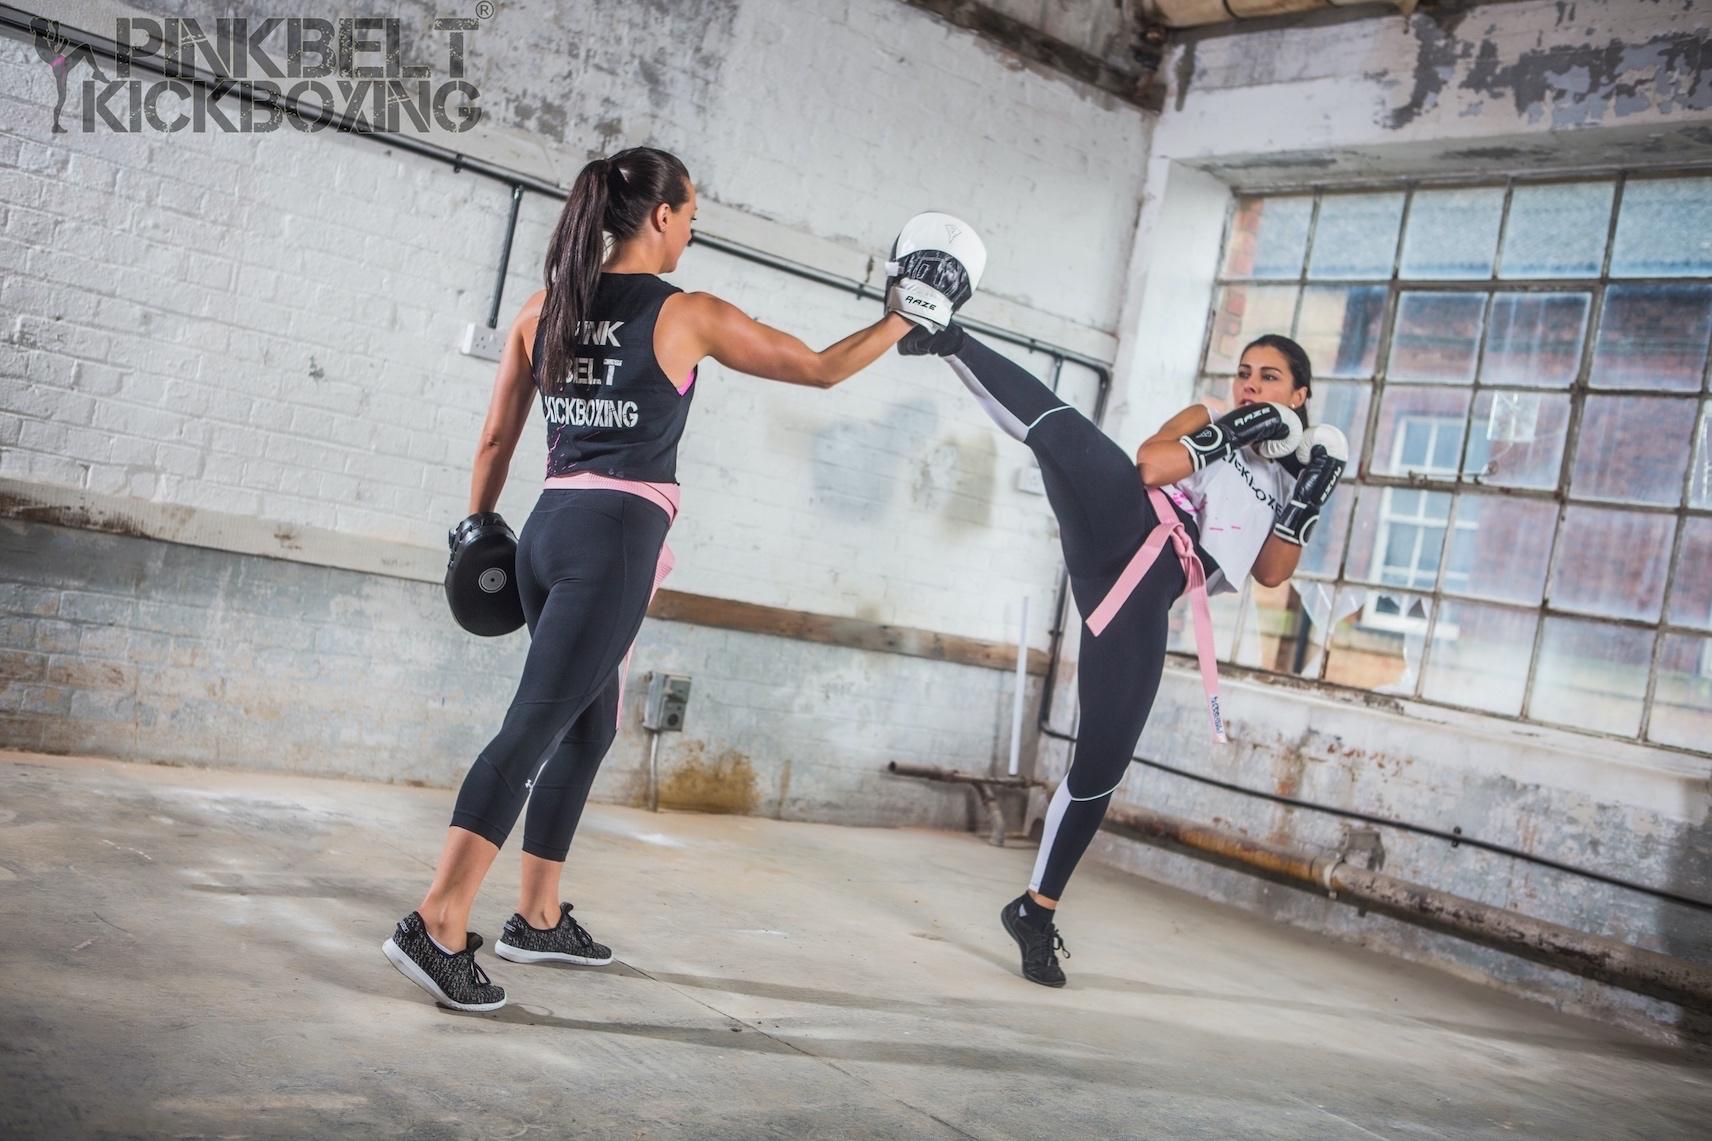 PinkBelt Kickboxing in Cardiff